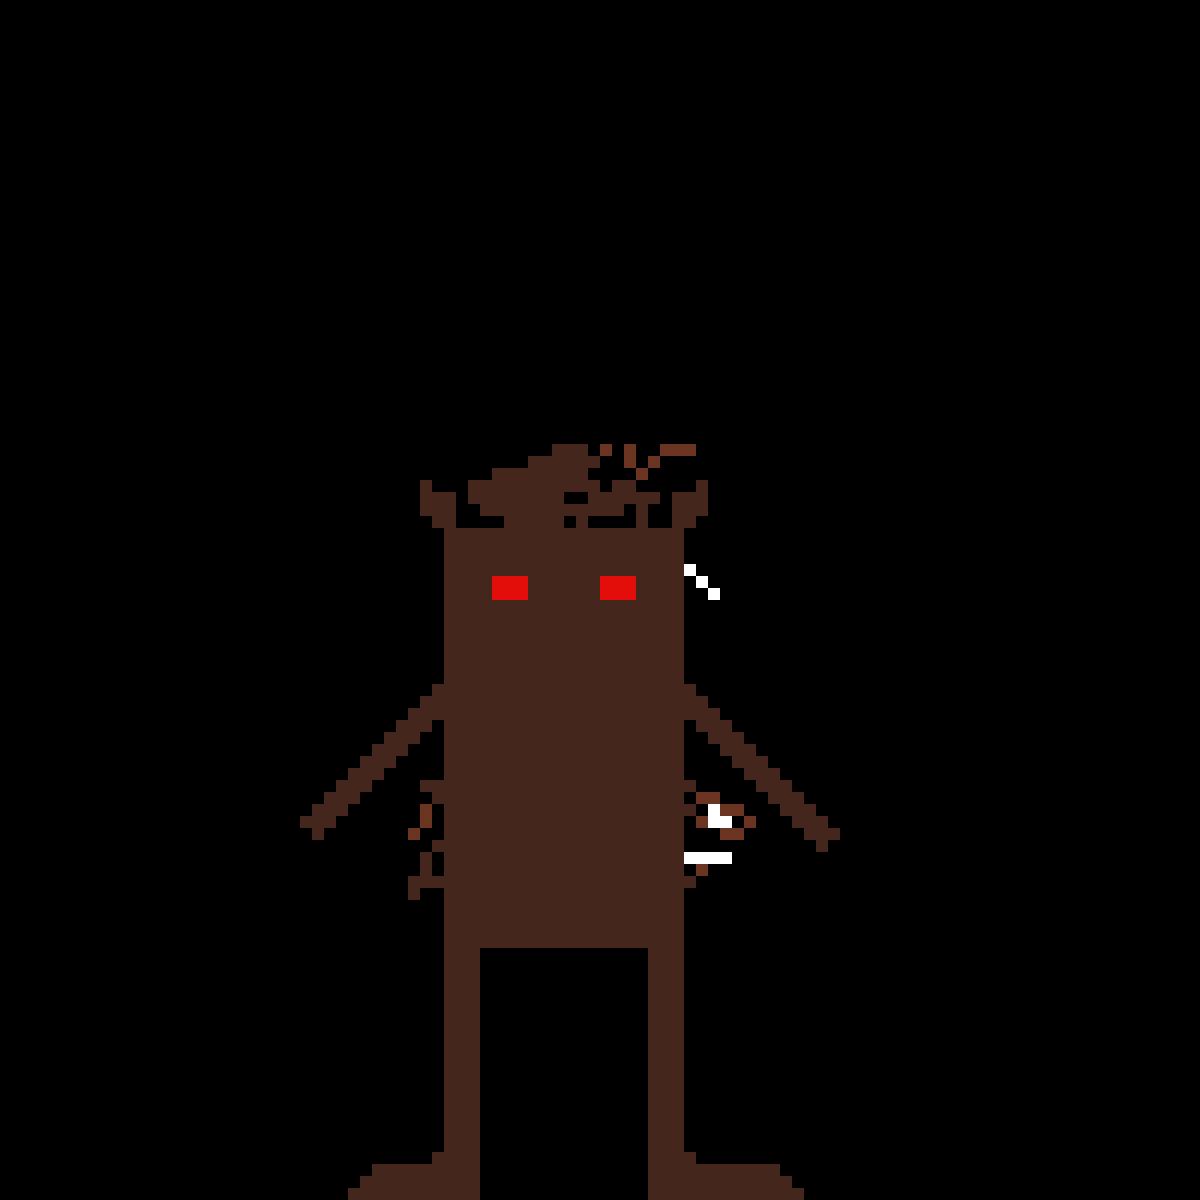 bigfoot(0087) by spookyraptor